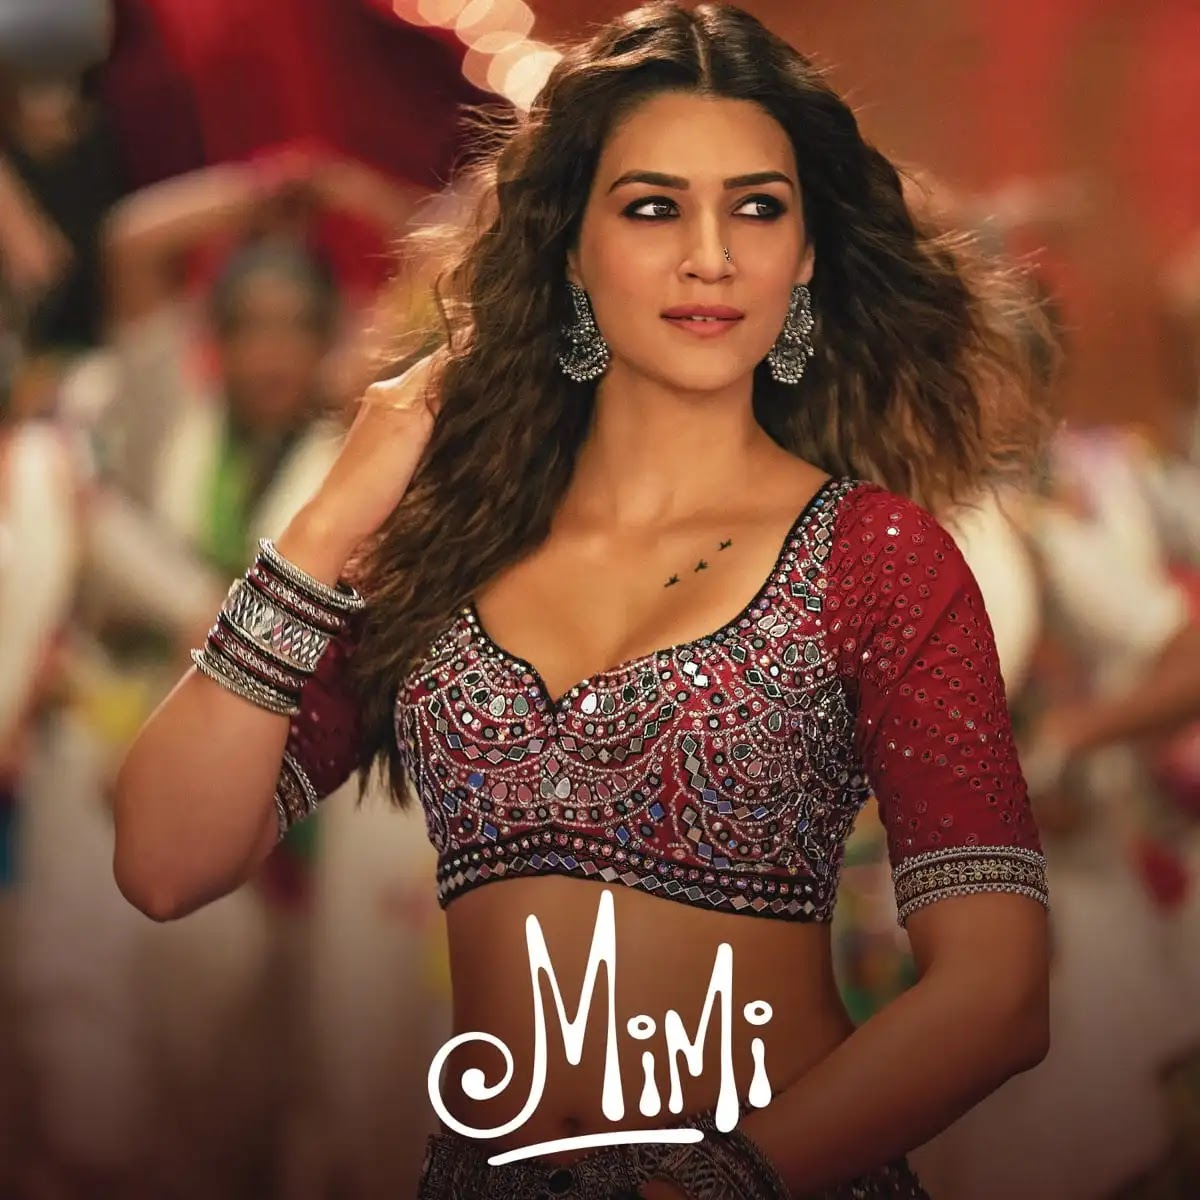 Param Sundari Mimi Mp3 Song Download 320kbps Free